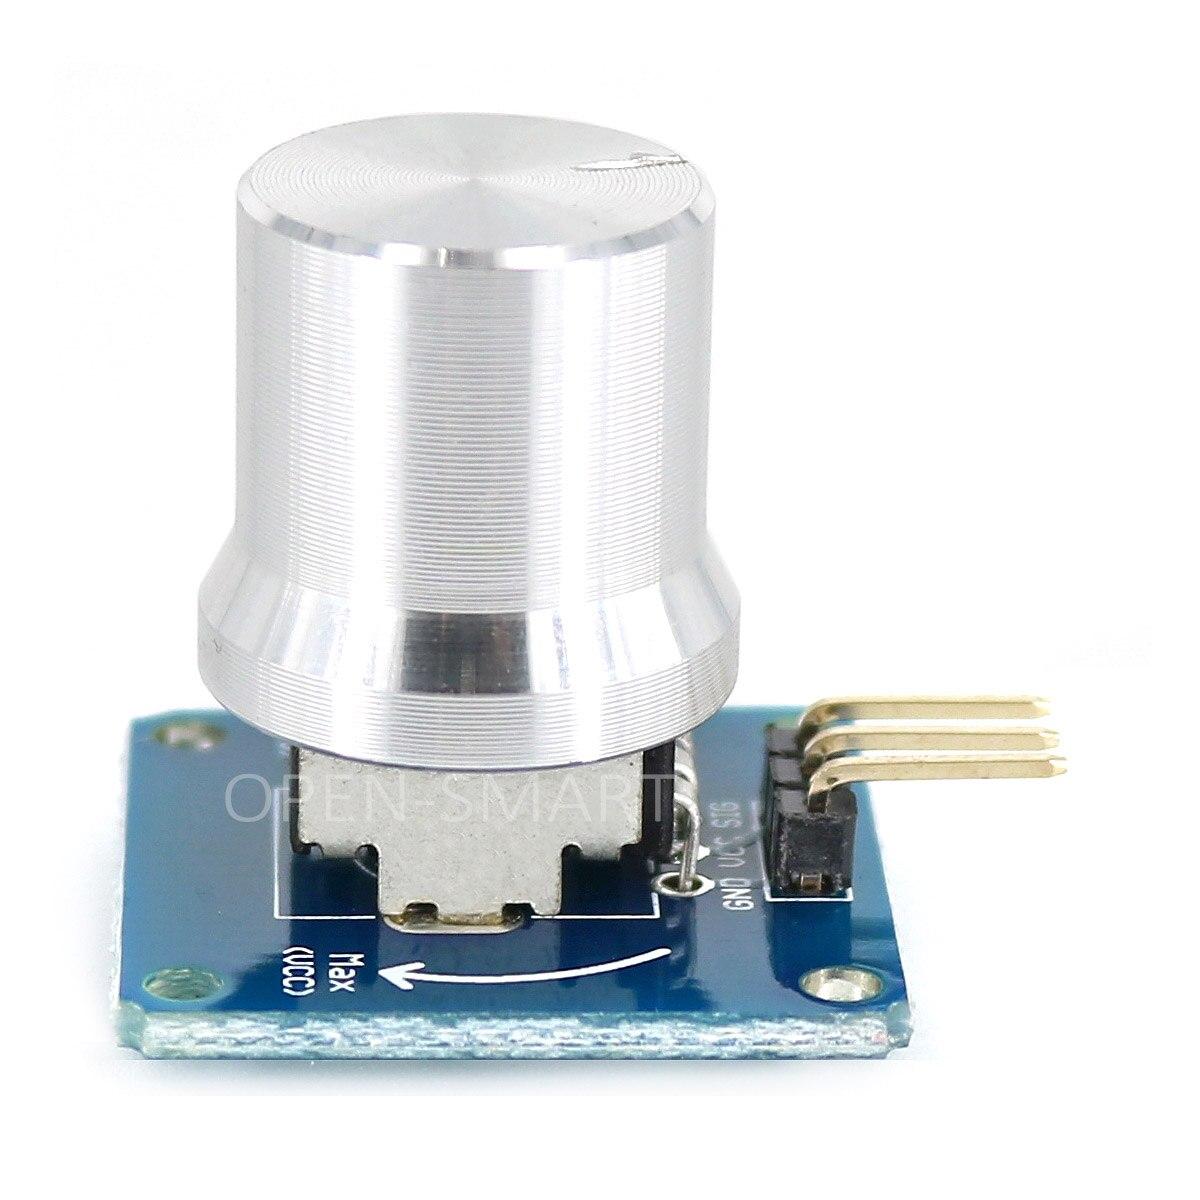 Rotation Angle Sensor, Adjustable Potentiometer, Knob Switch, Adjust Volume, Dimming Brightness